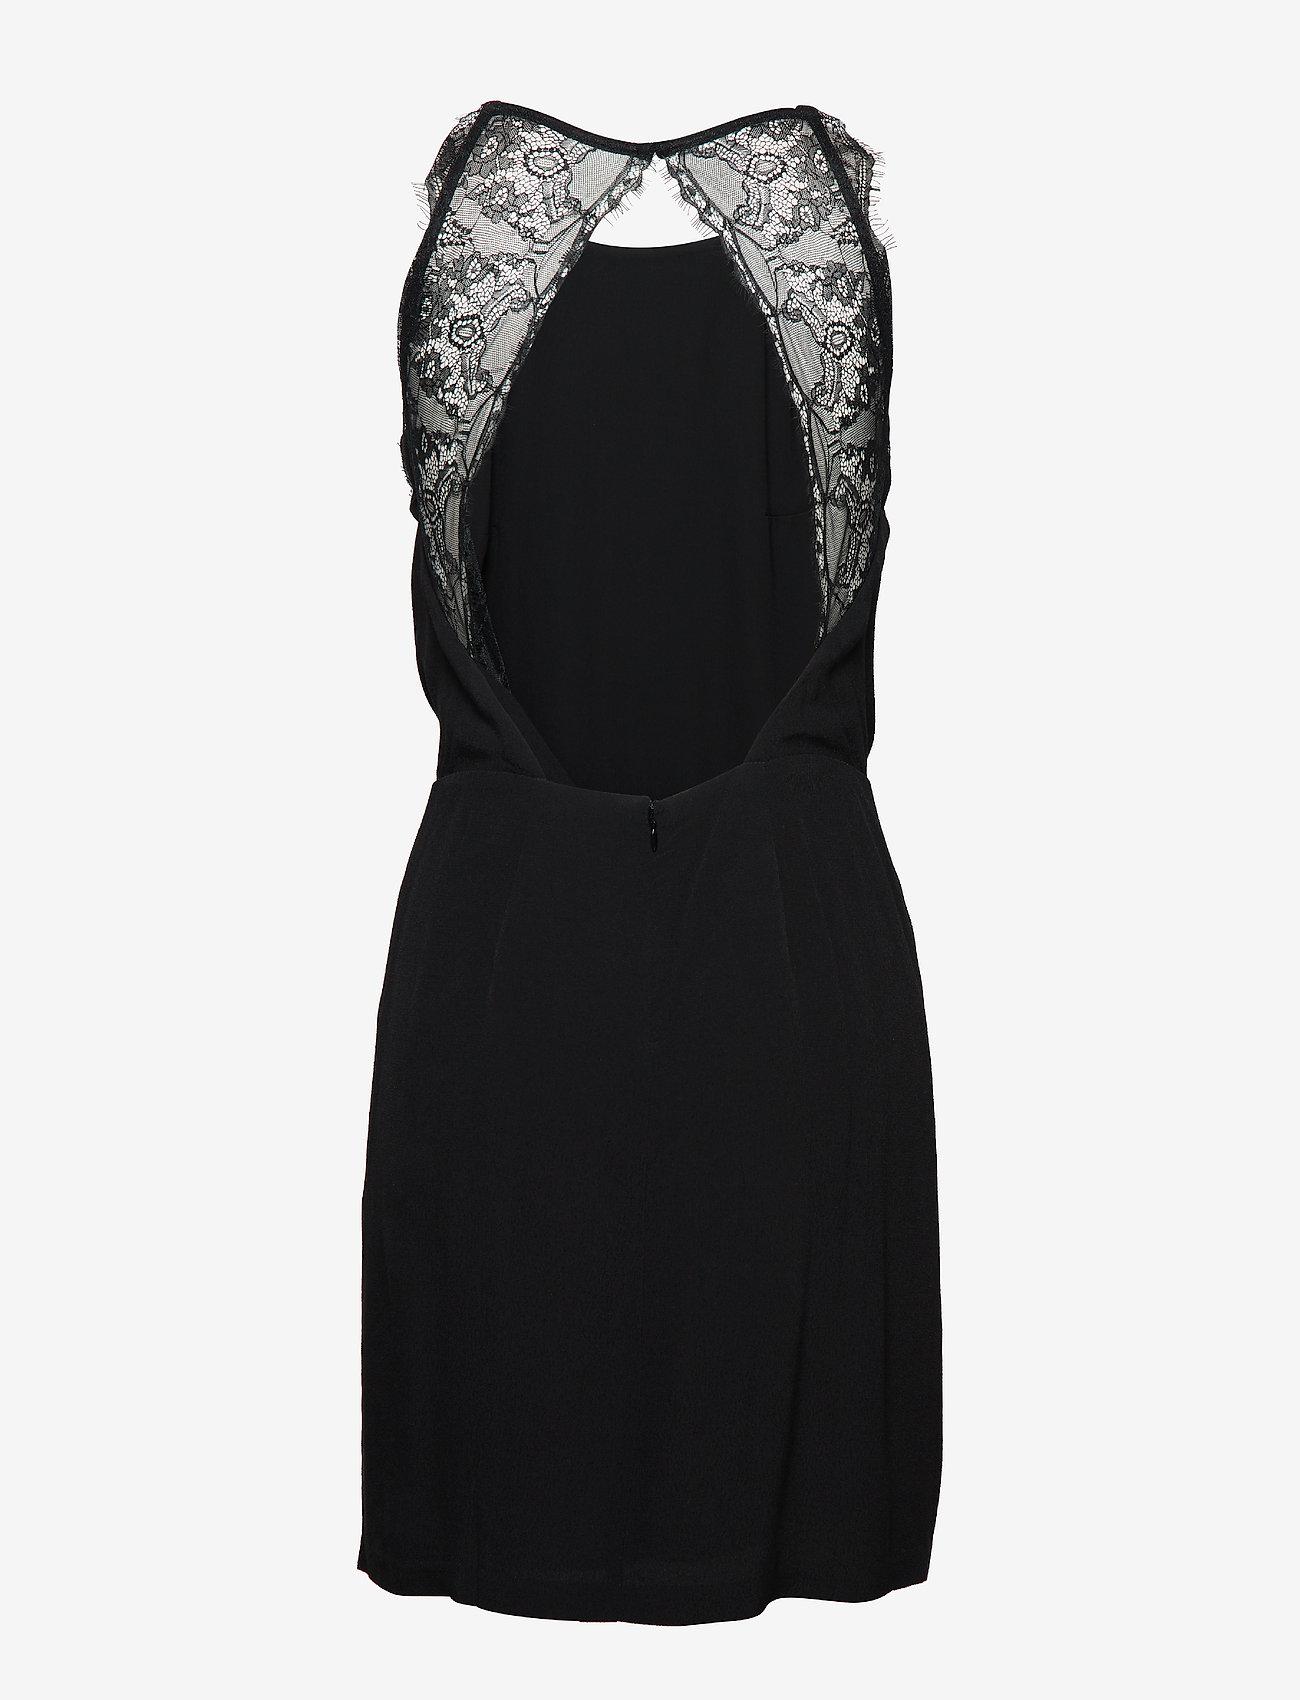 Samsøe Samsøe - Willow short dress 5687 - short dresses - black